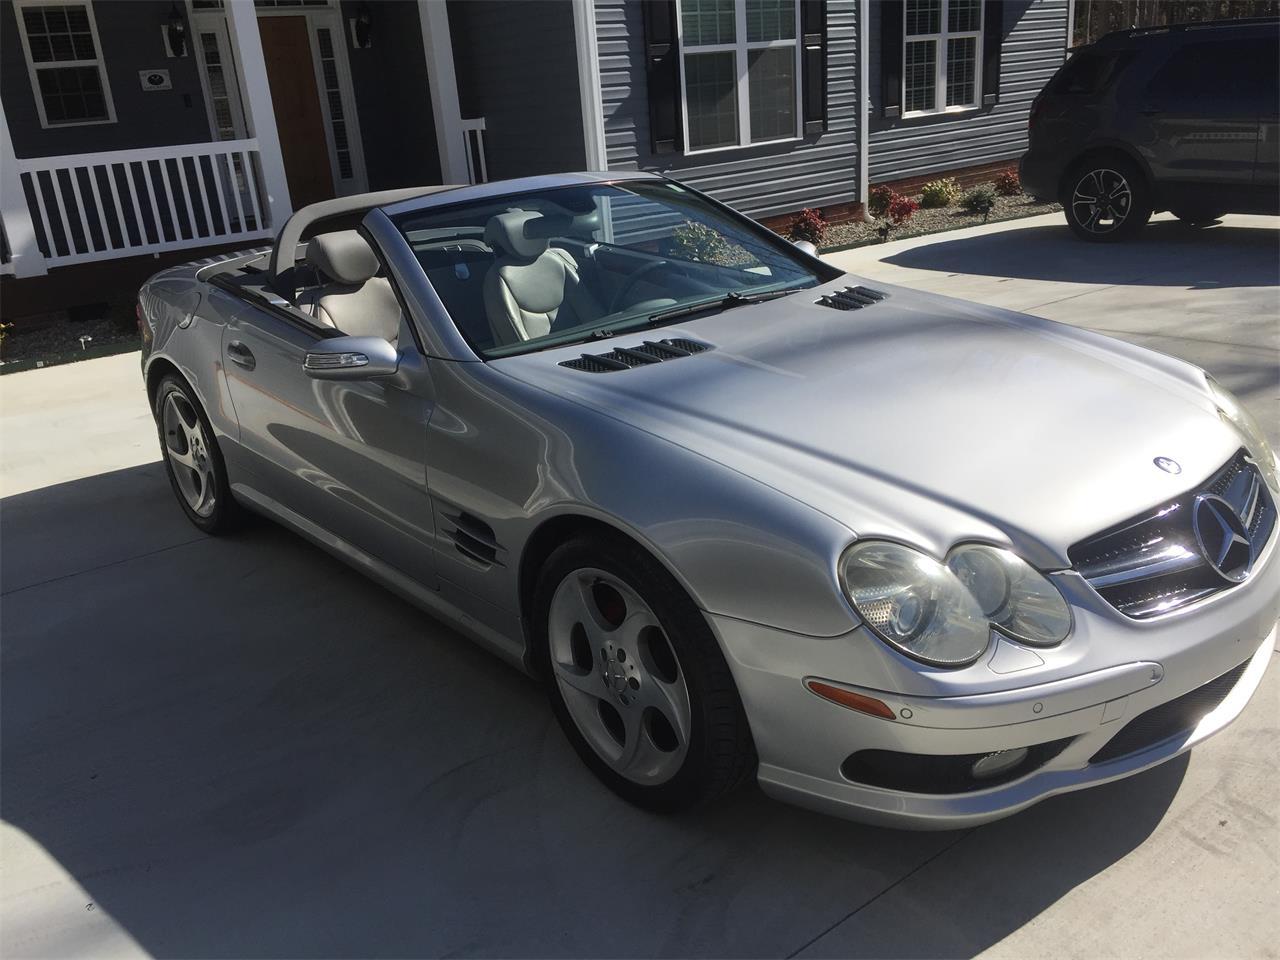 2005 Mercedes-Benz SL500 (CC-1314009) for sale in Manson, North Carolina